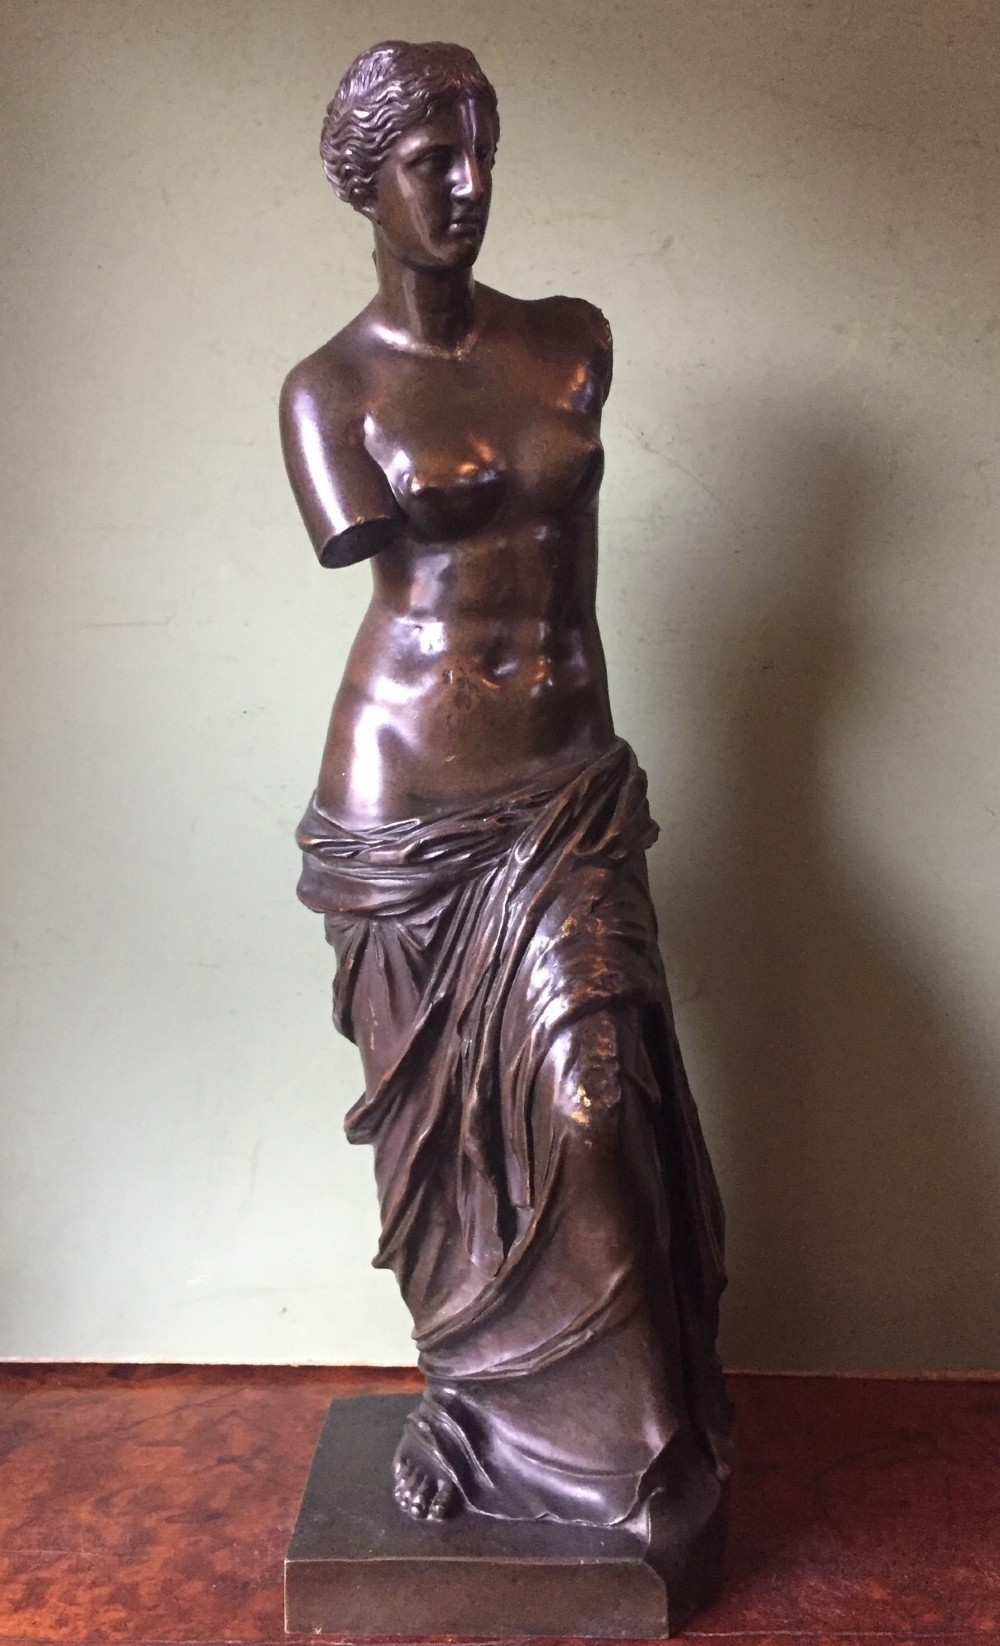 late c19th french or italian 'grand tour' souvenir bronze reduction of the 'venus di milo'